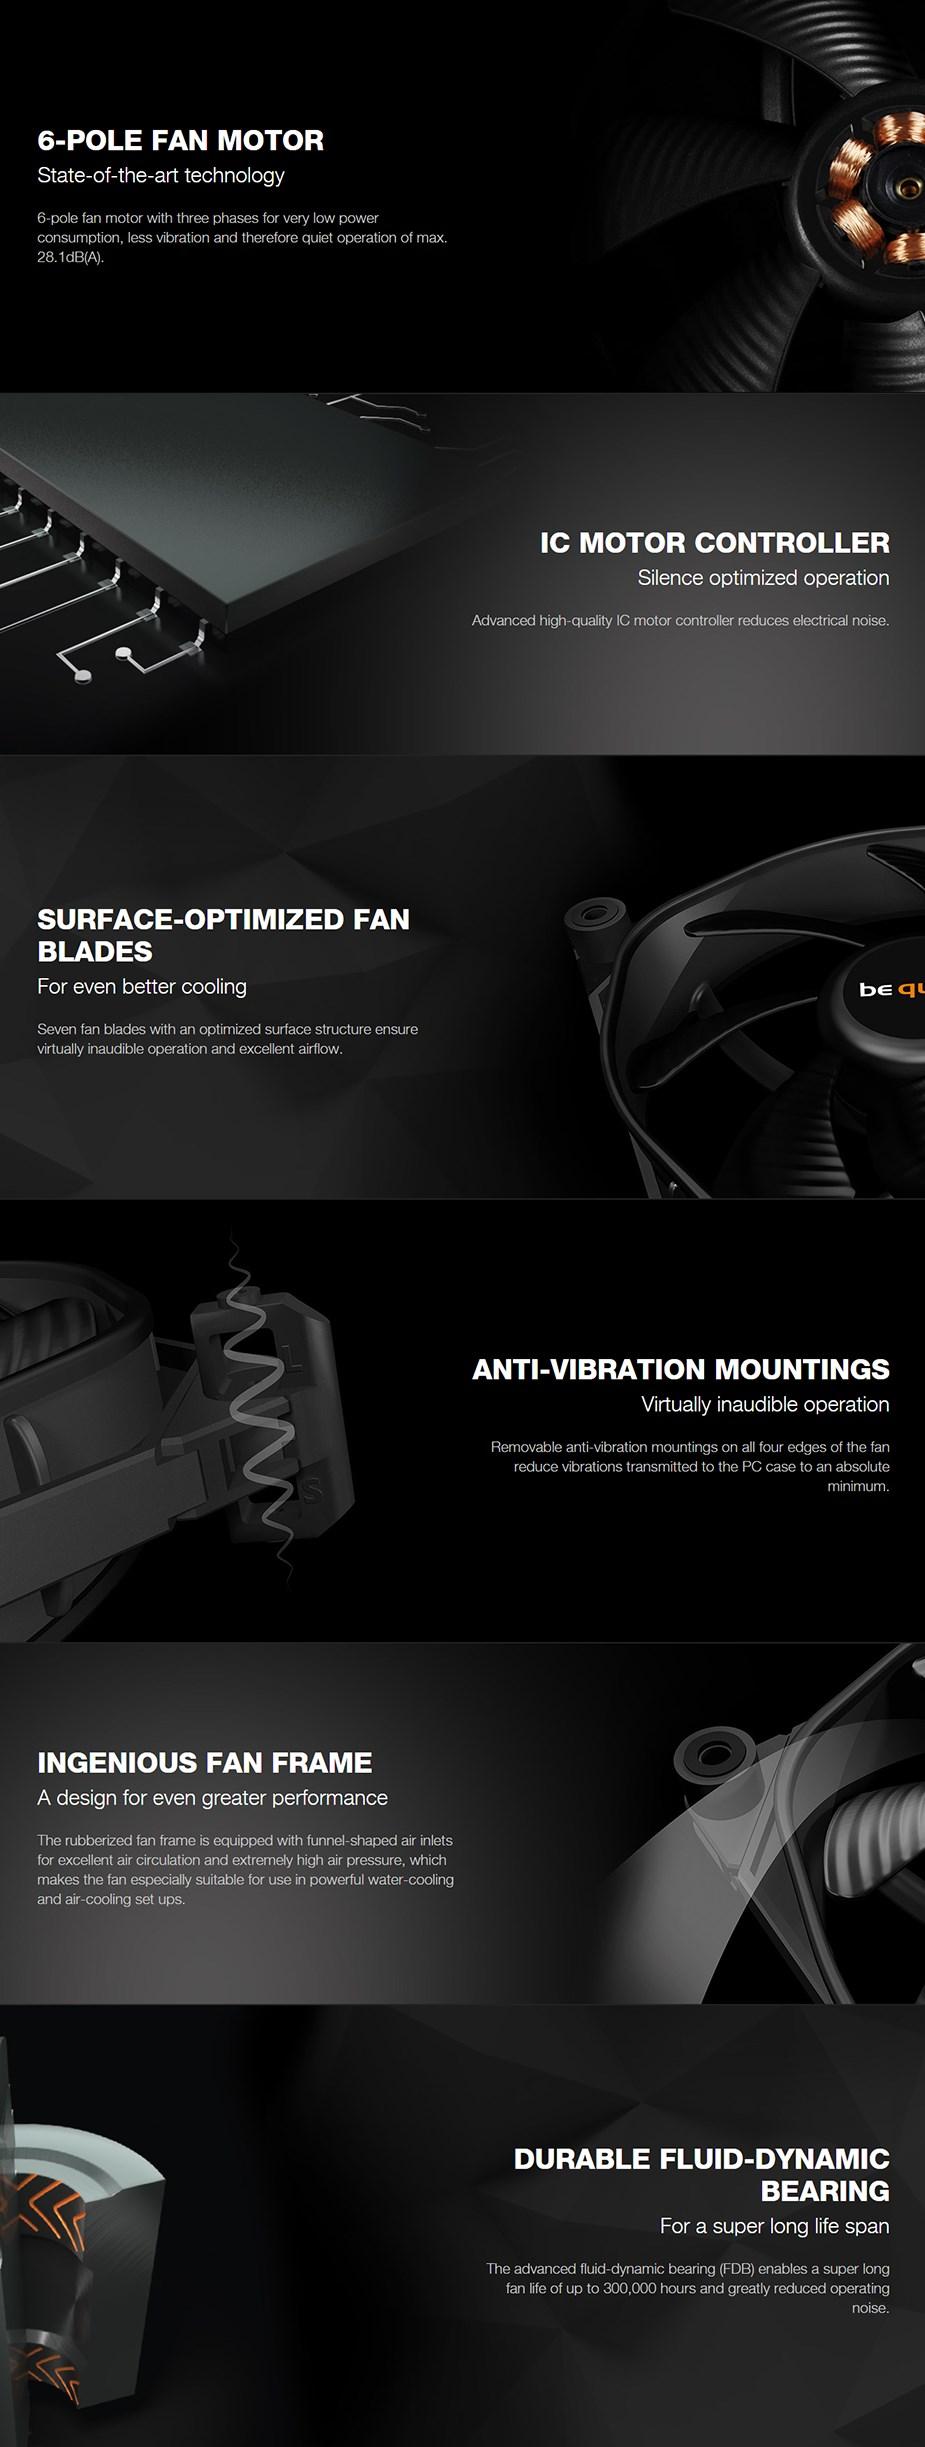 be quiet! Silent Wings 3 140mm Case Fan - High-Speed Edition - Desktop Overview 1